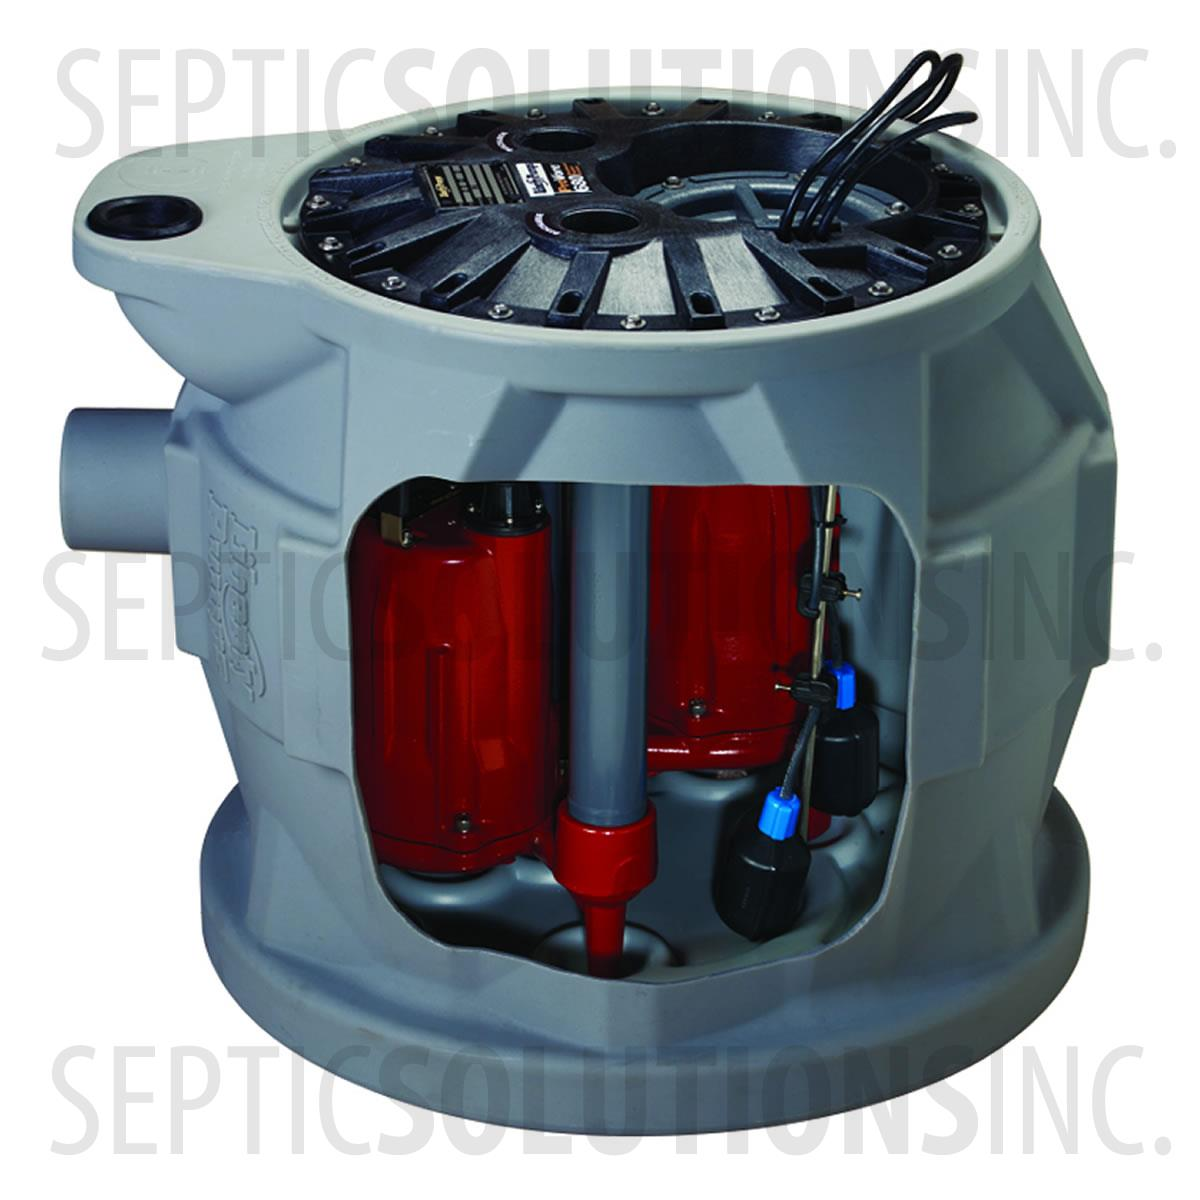 Liberty Provore 680 1 0 Hp Duplex Sewage Grinder System